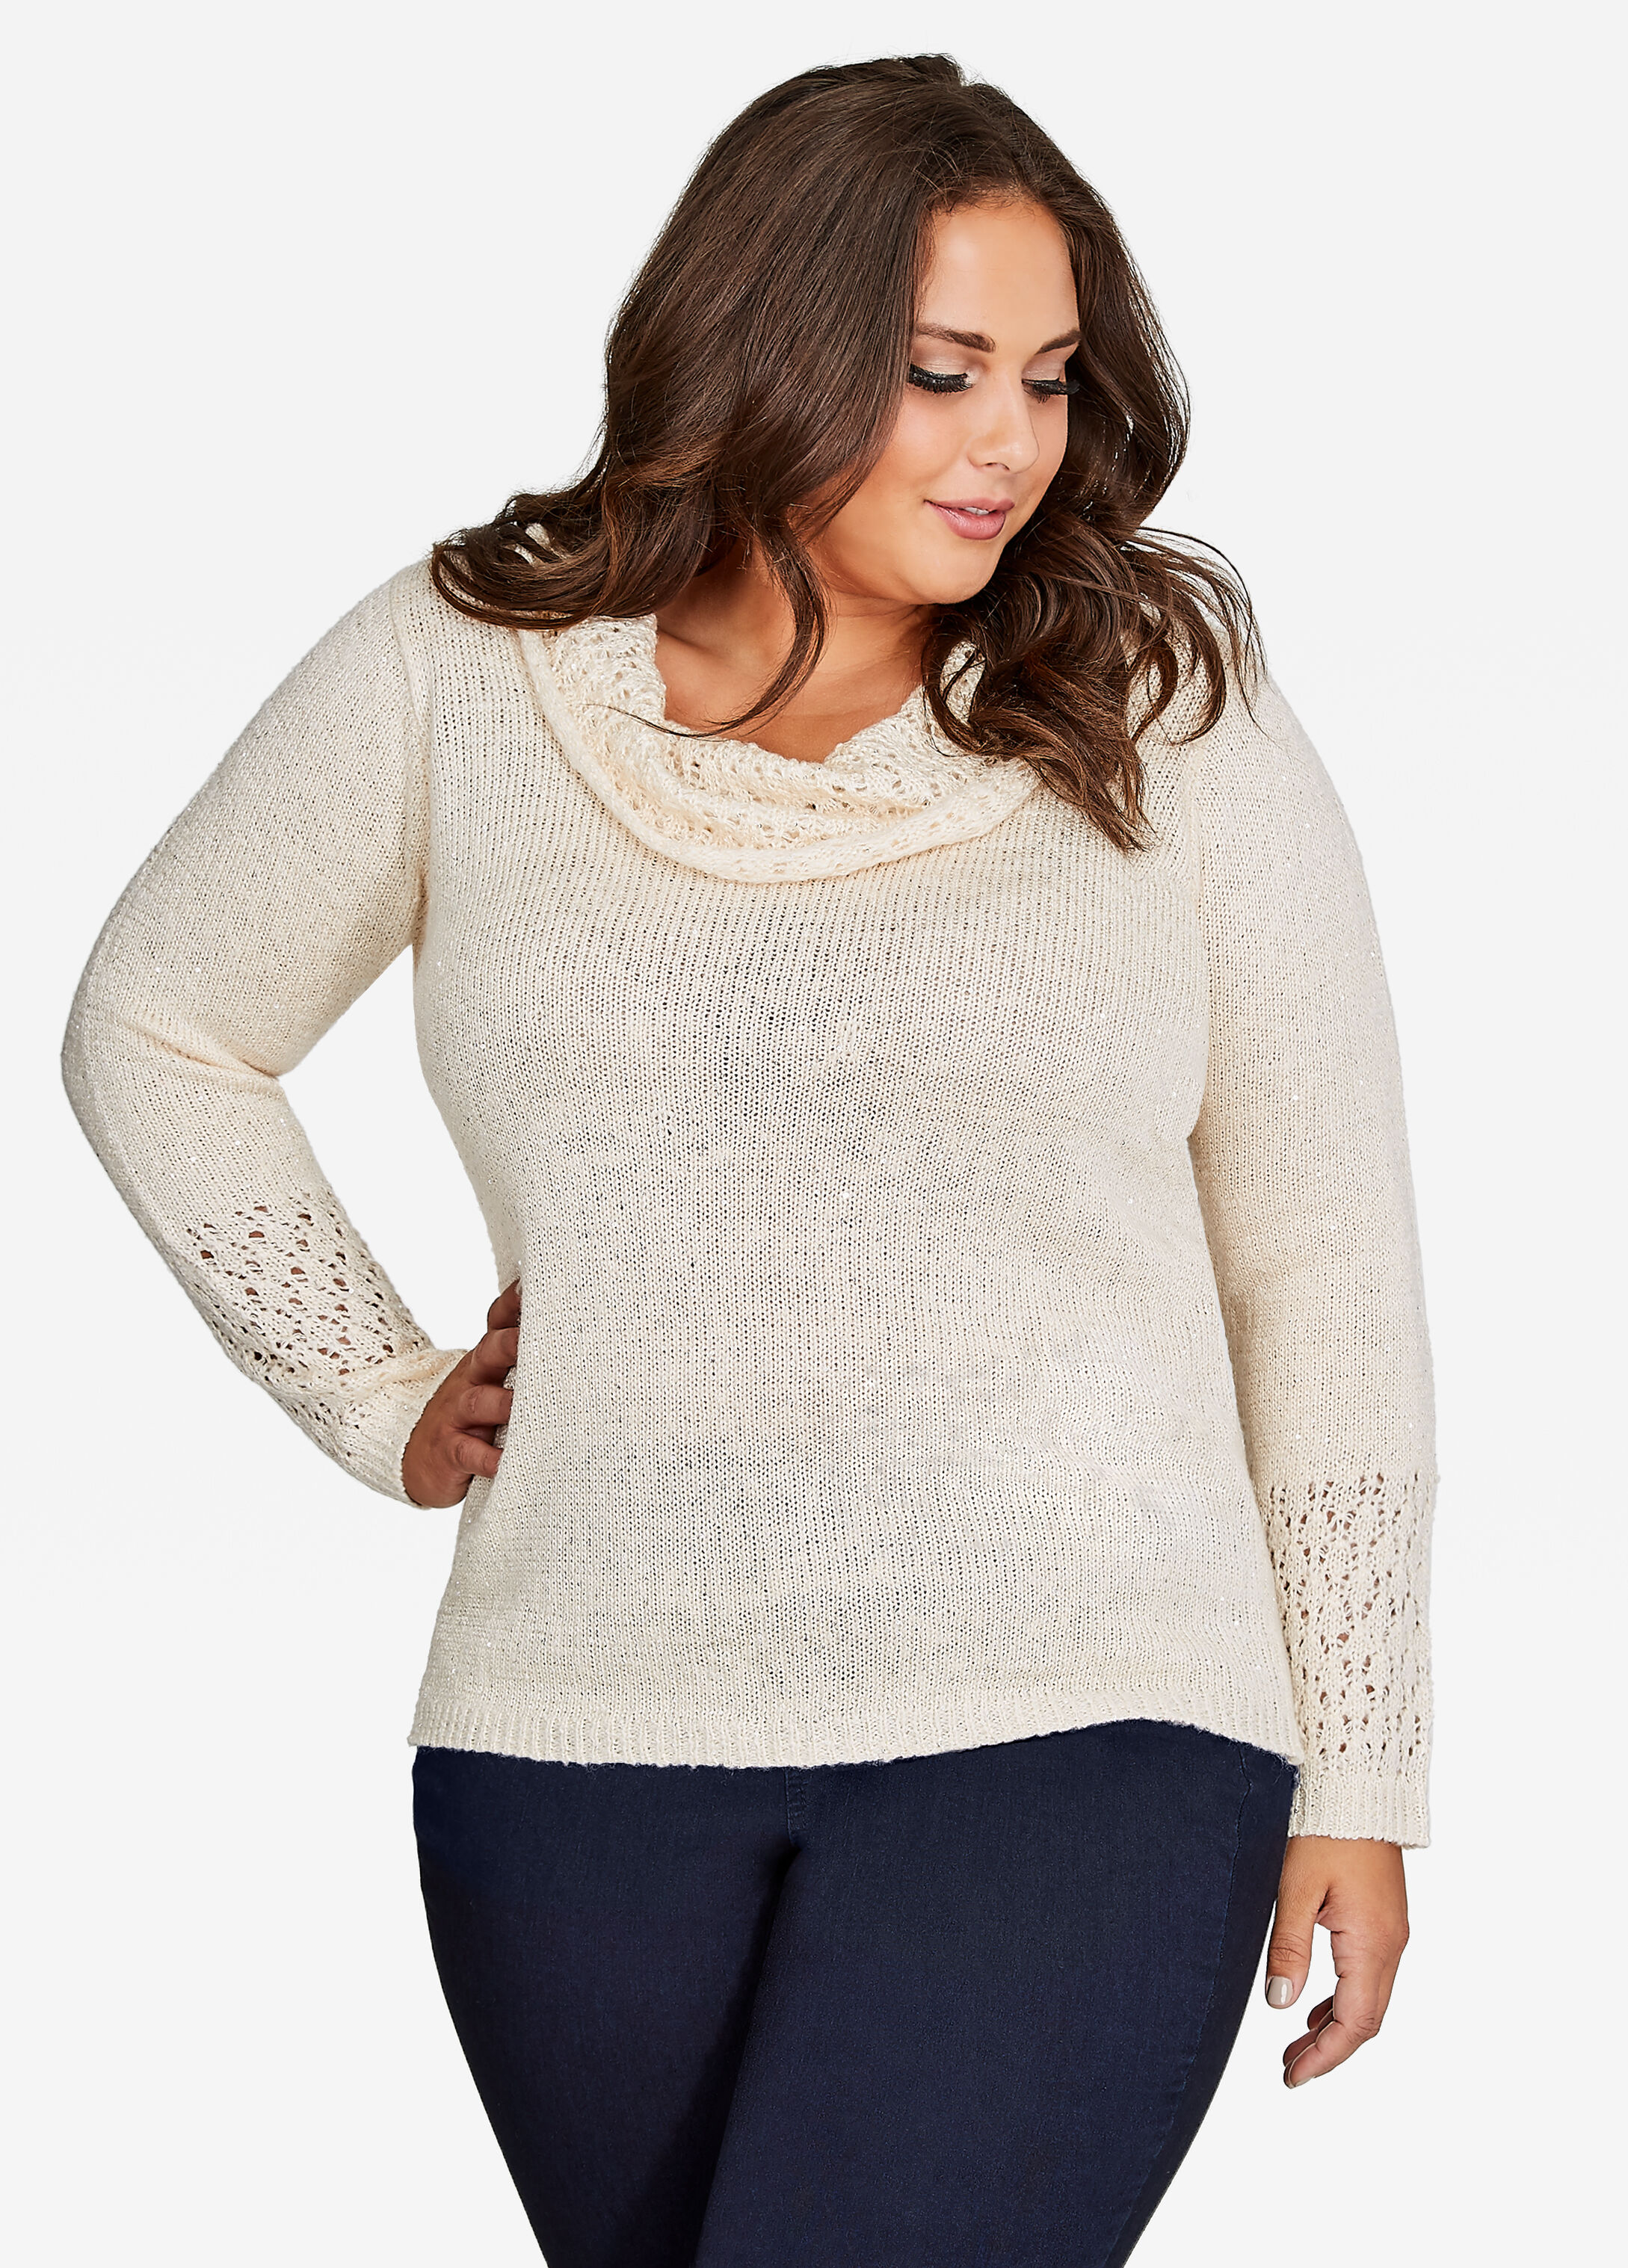 Sequin Cowl Neck Sweater